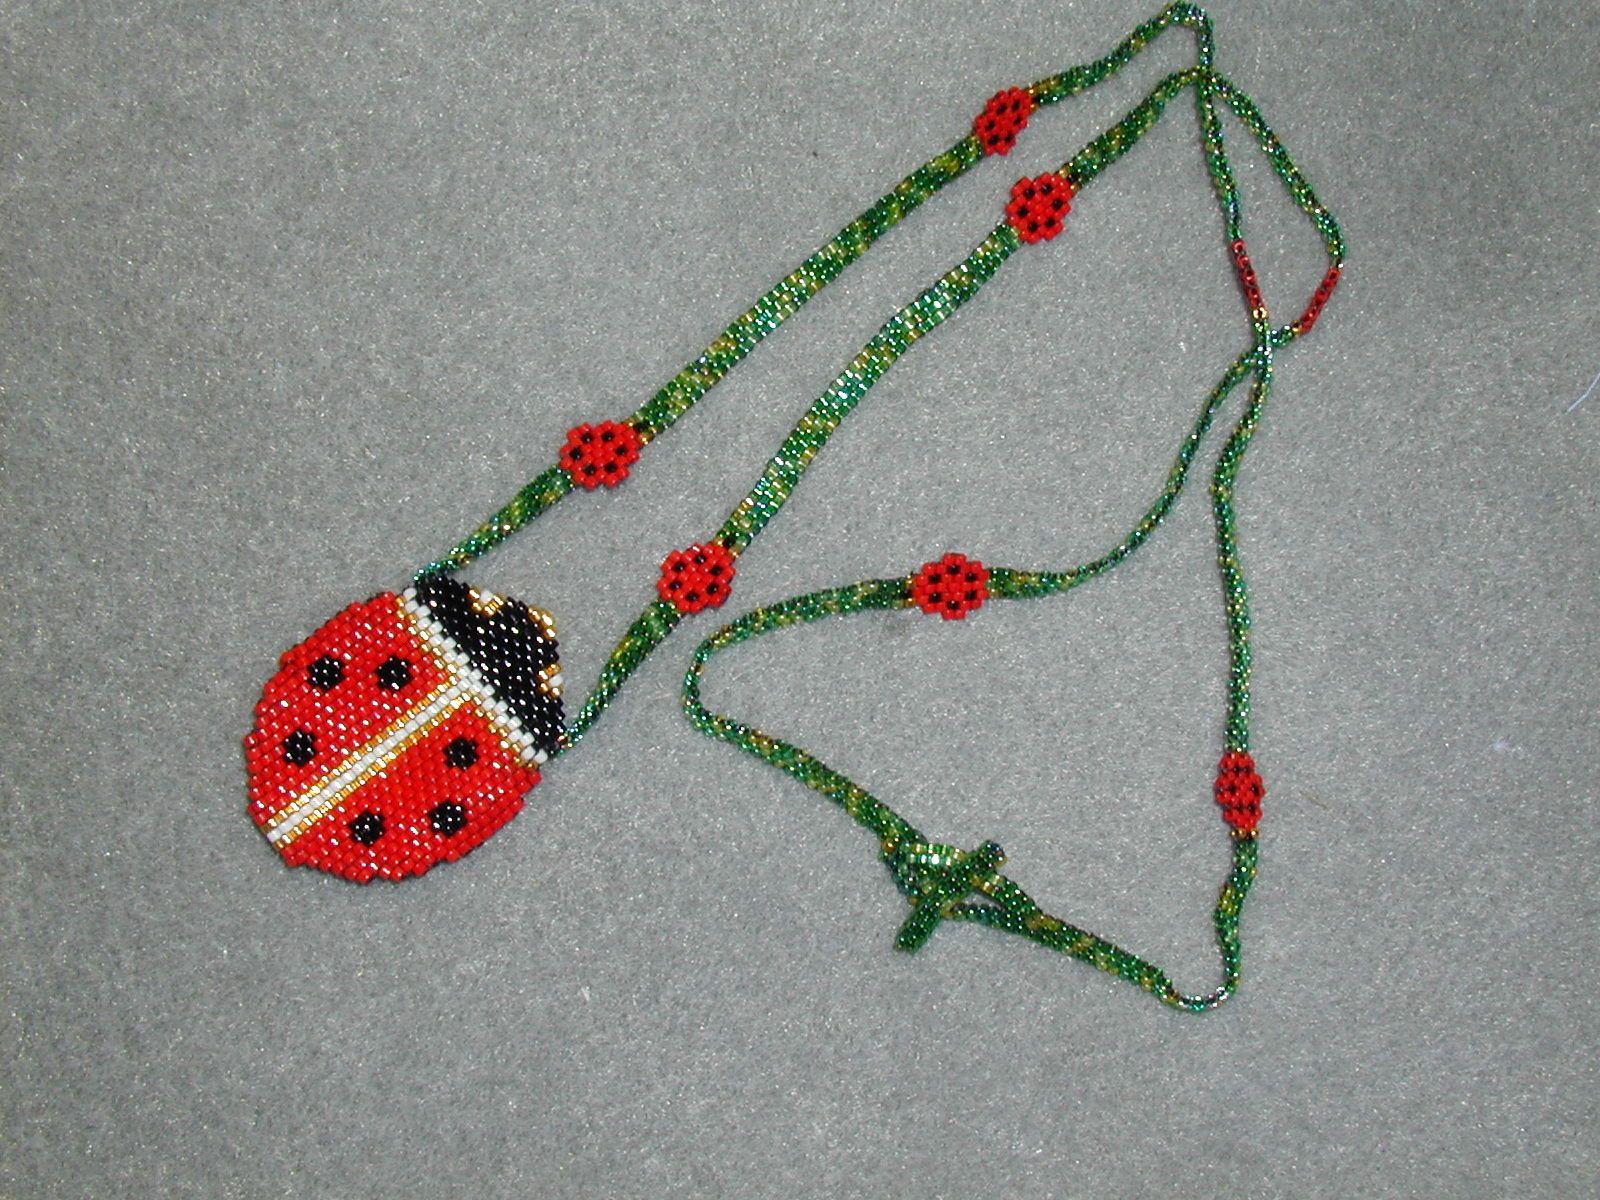 peyote amulet bags | Ladybug Amulet Bag | Jewelry to make or buy ...